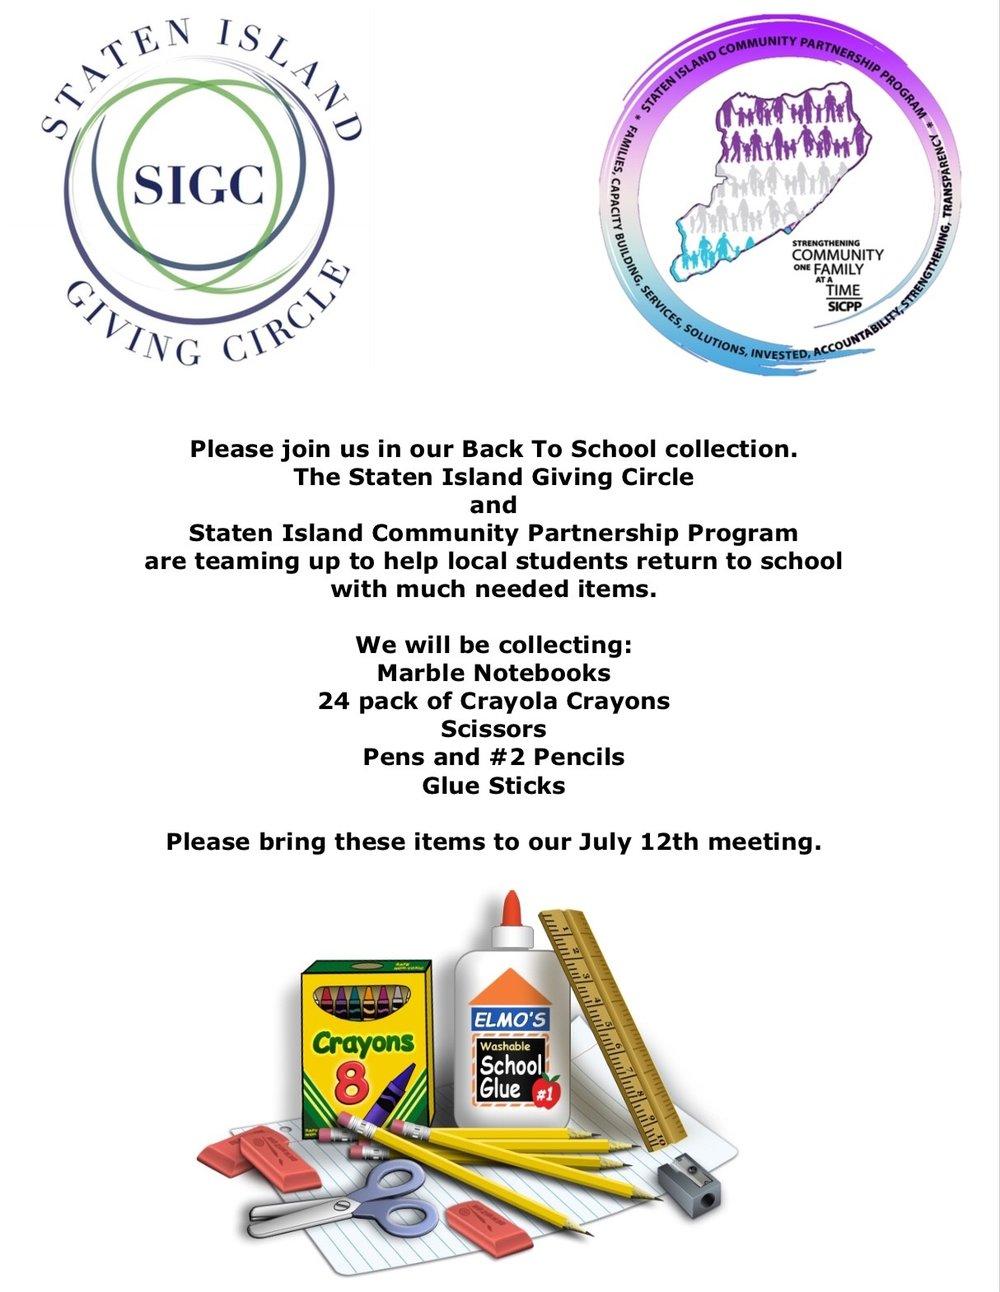 SIGC_SICPP school supply drive.jpg